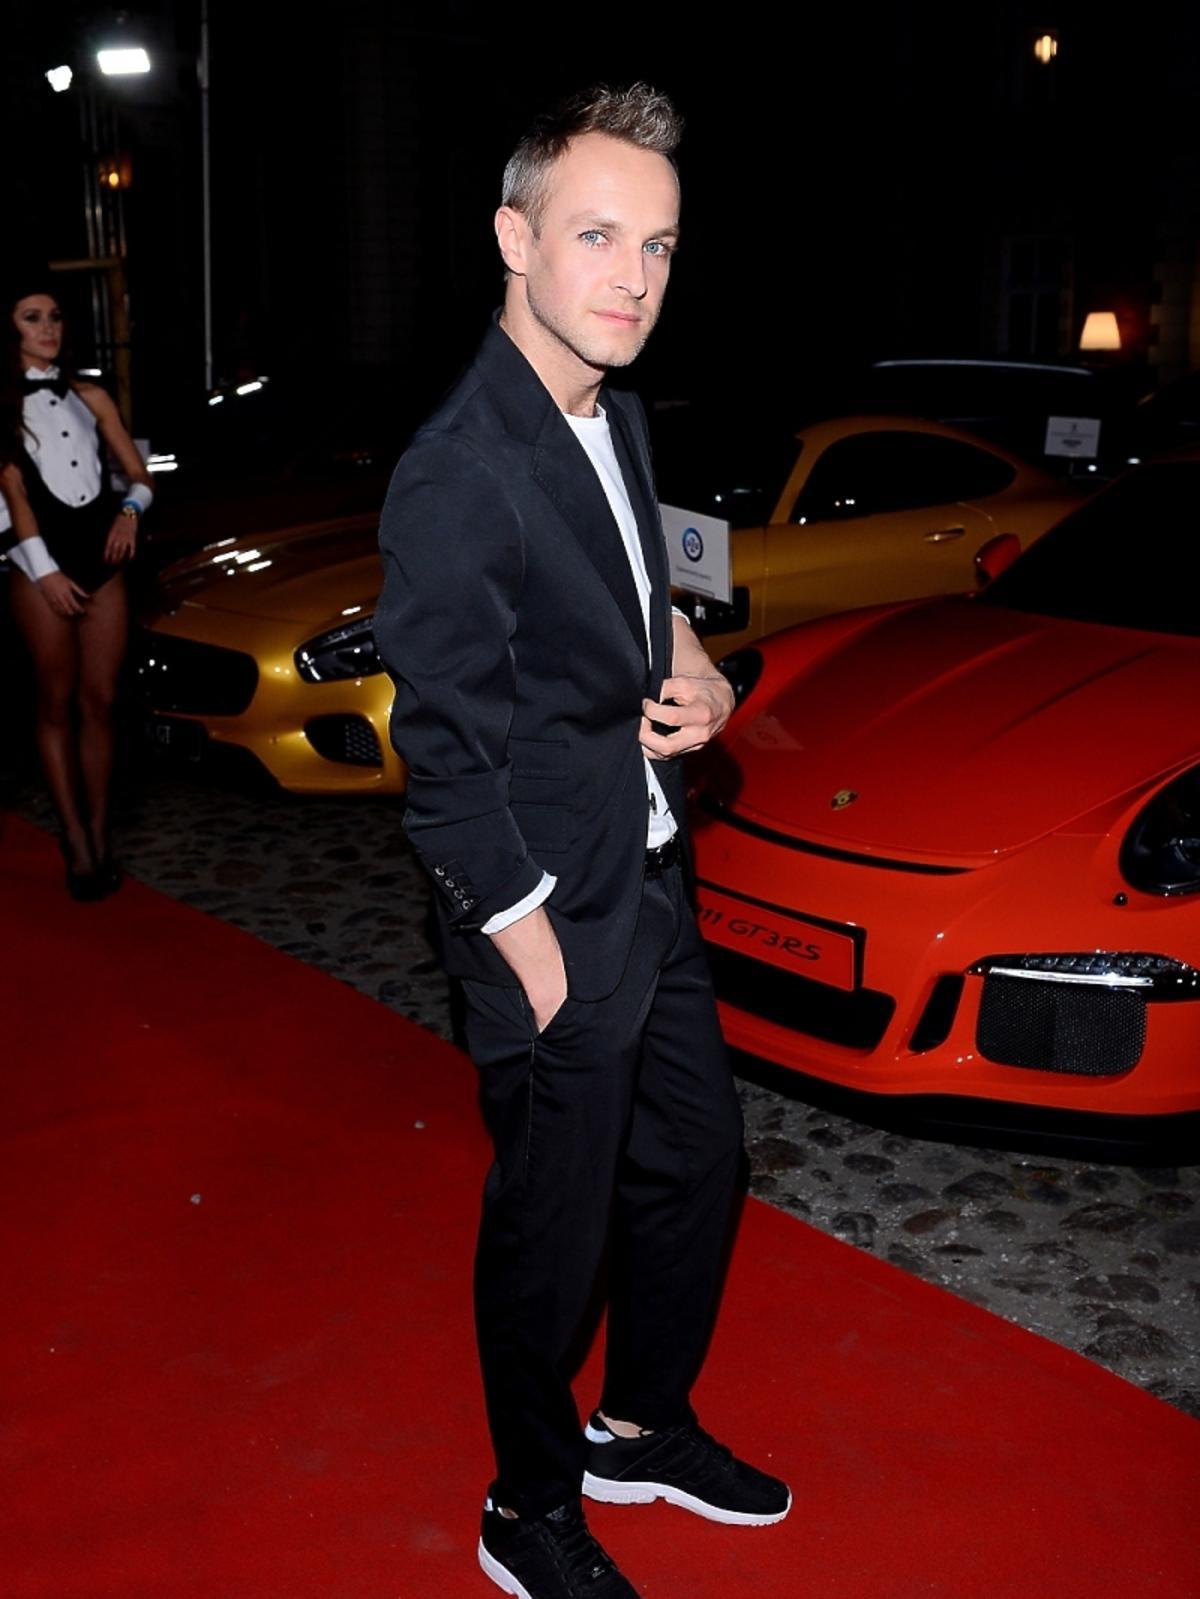 Artur Chamski na imprezie Samochód Roku Playboya